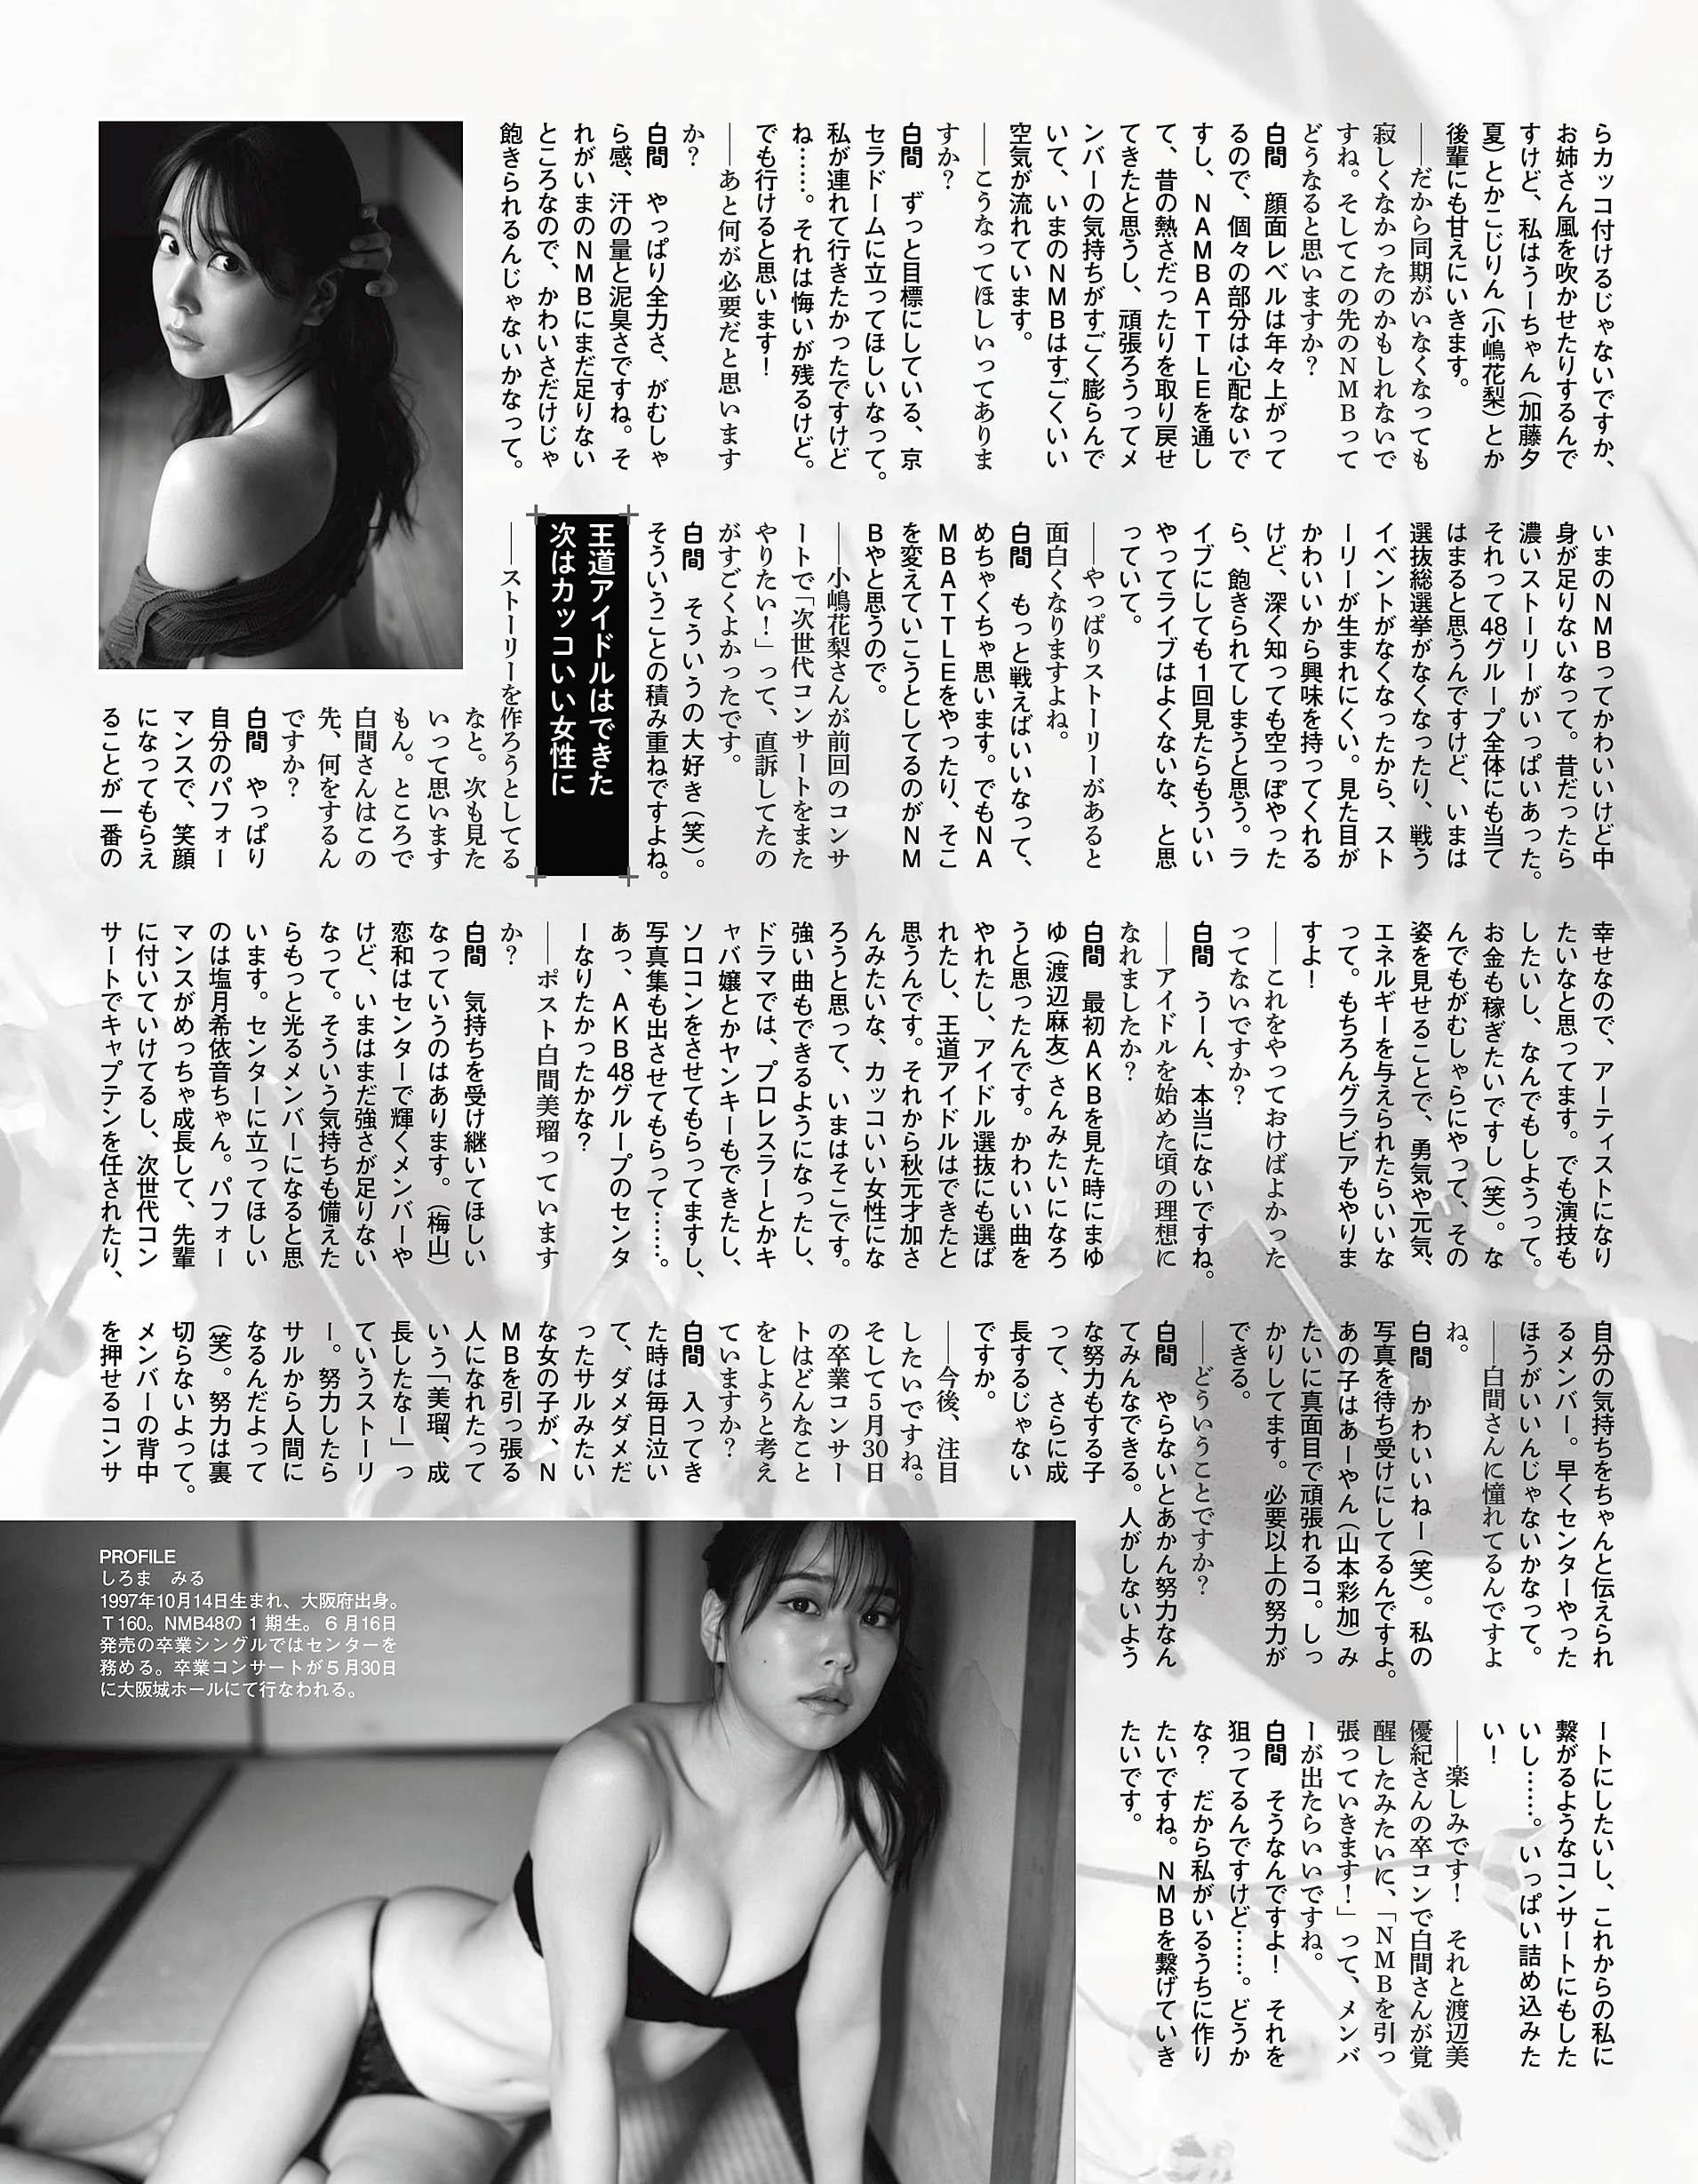 Miru Shiroma EX-Taishu 2106 12.jpg